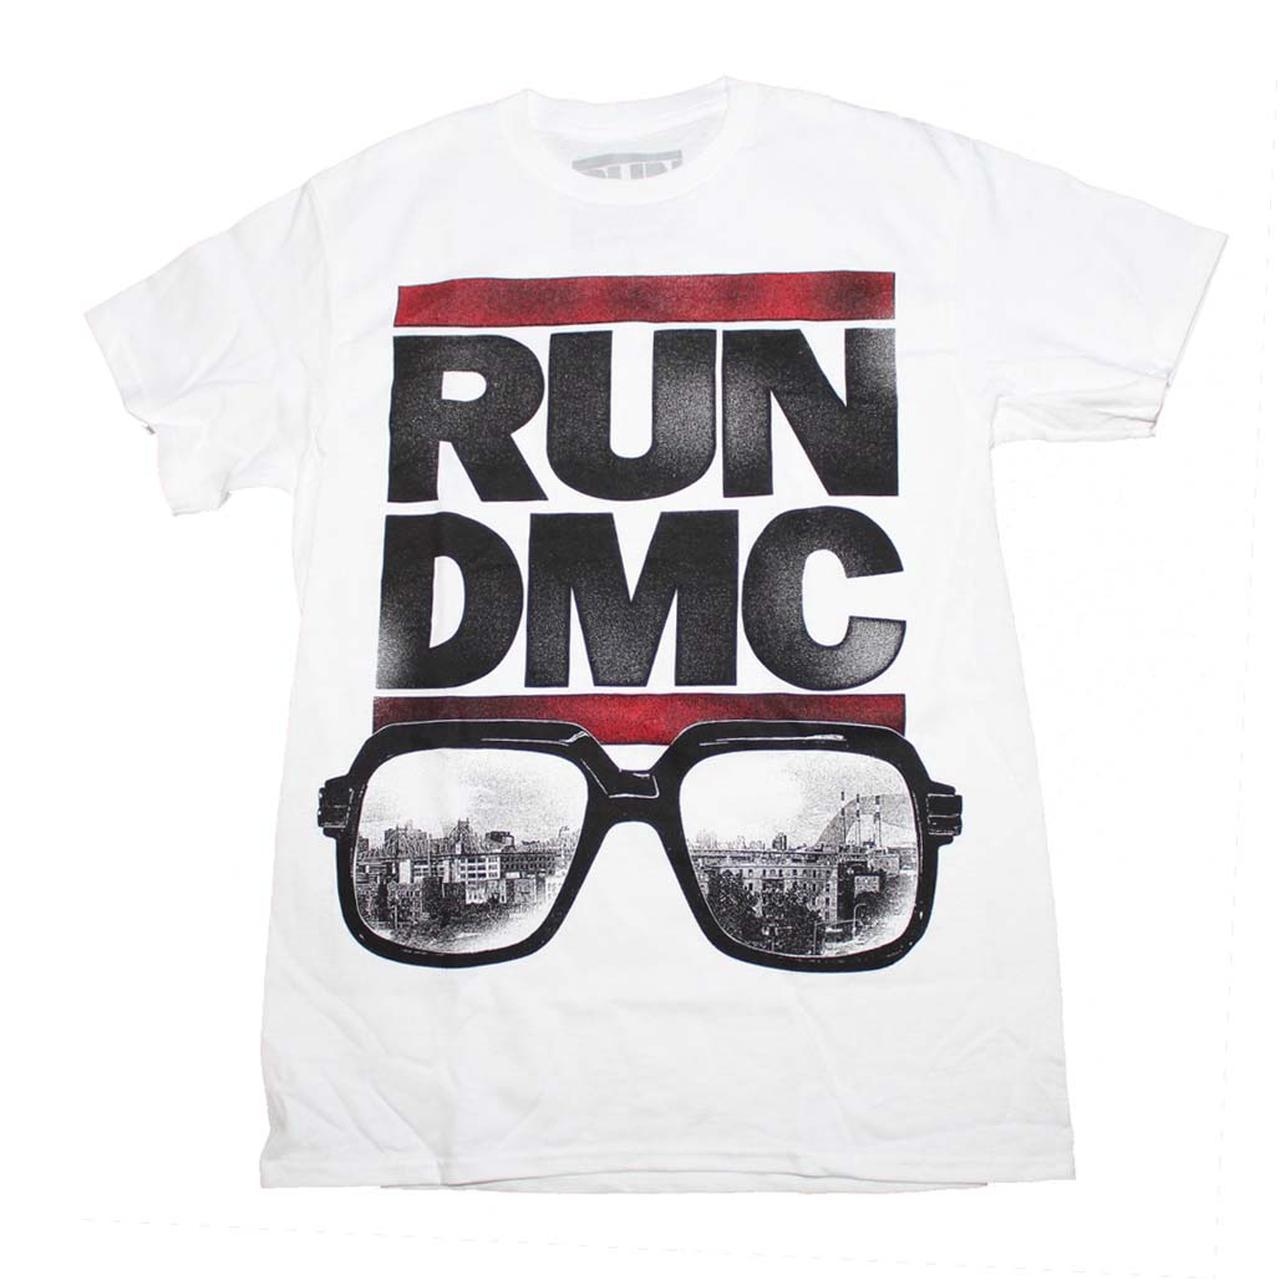 run dmc t shirt run dmc glasses nyc t shirt. Black Bedroom Furniture Sets. Home Design Ideas